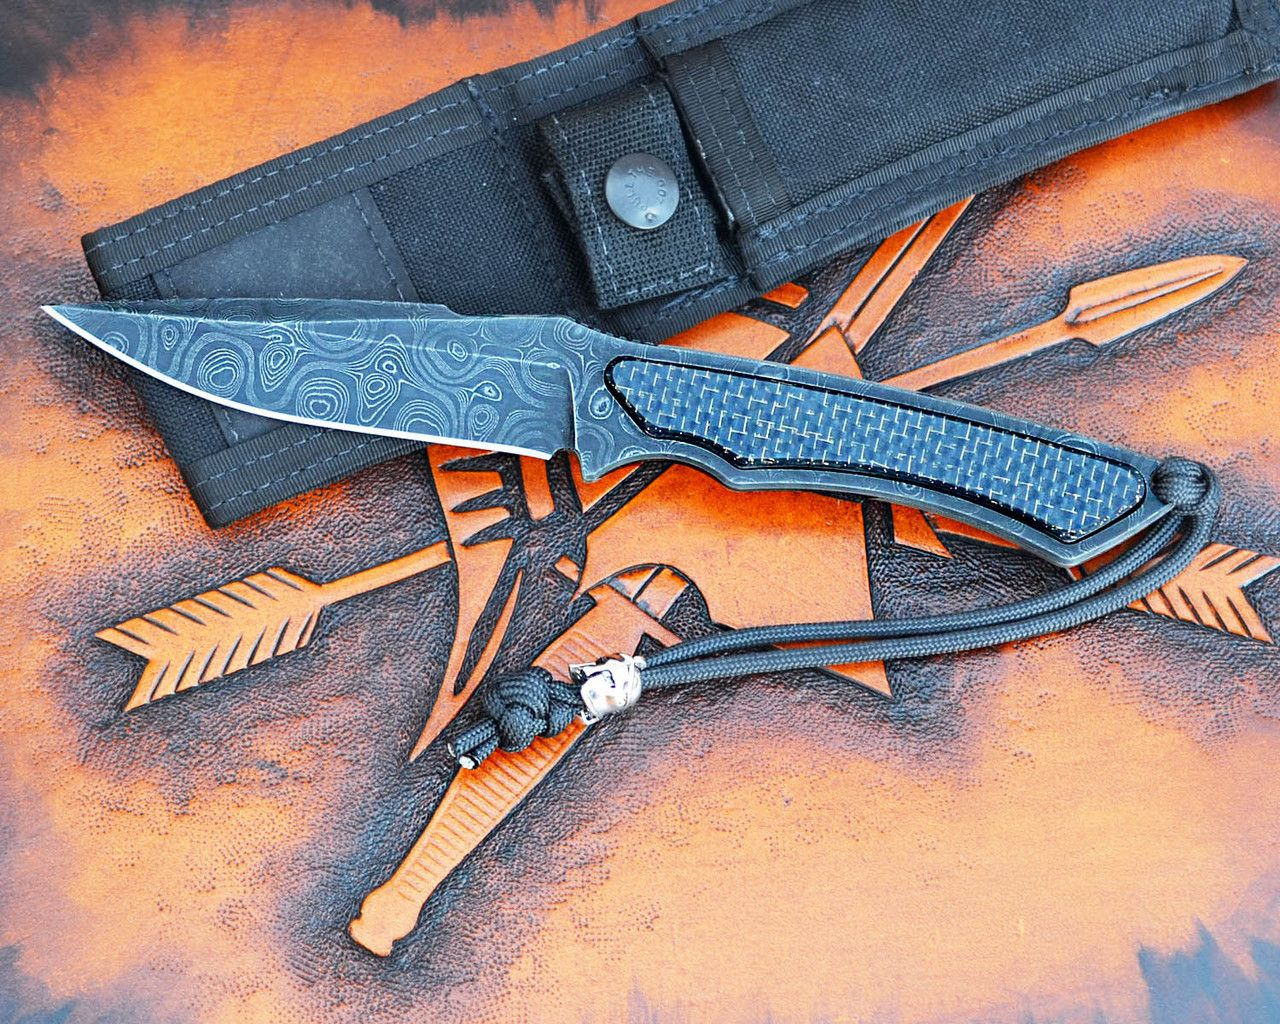 Special Edition - Phrike - Chad Nichols Damascus / Lightening Strike CF - Spartan Blades, LLC